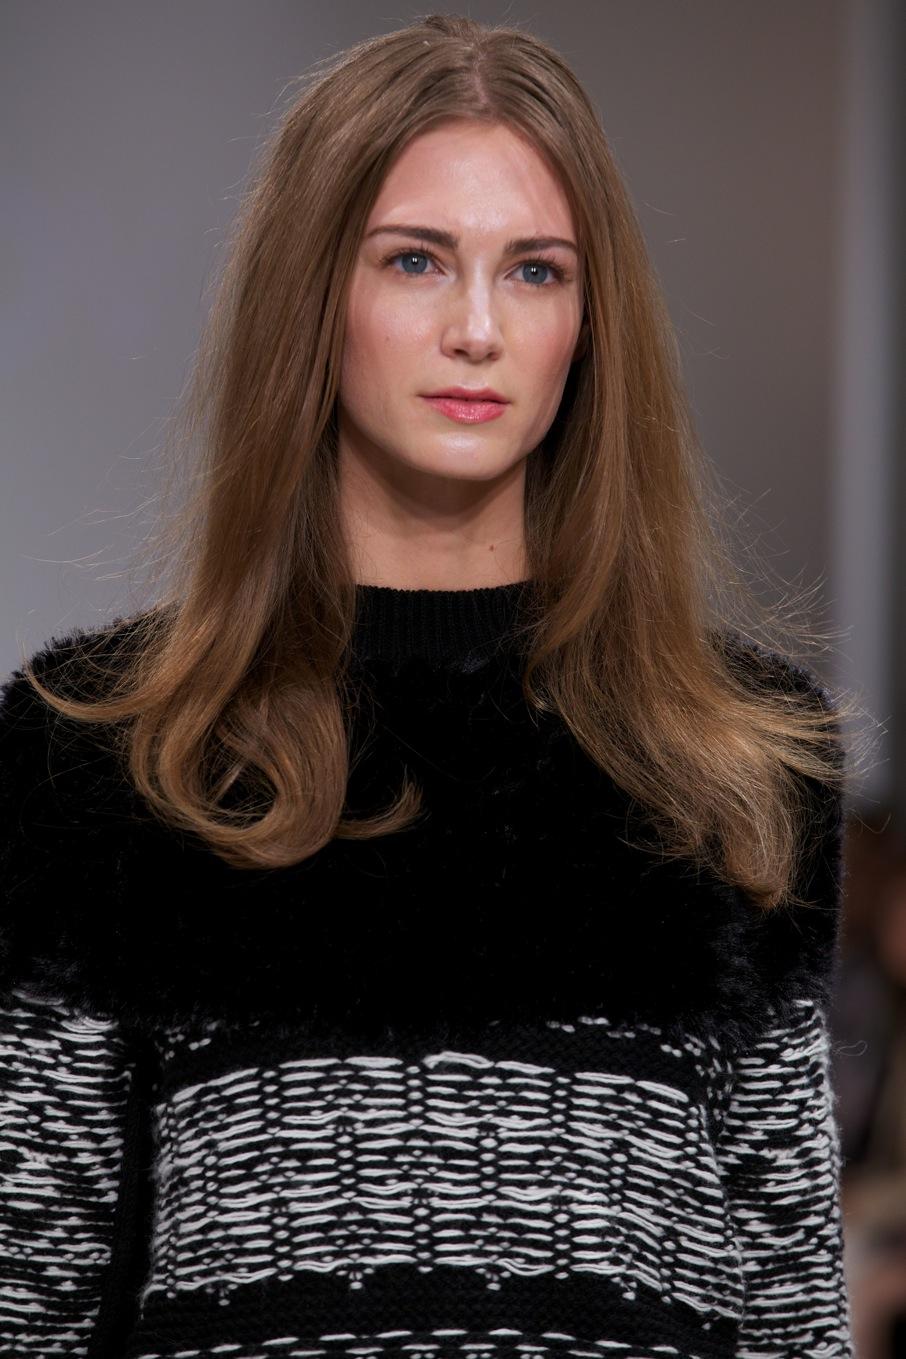 Kiev Fashion Days A-W 2014 (c) Marc aitken 2014  70.jpg